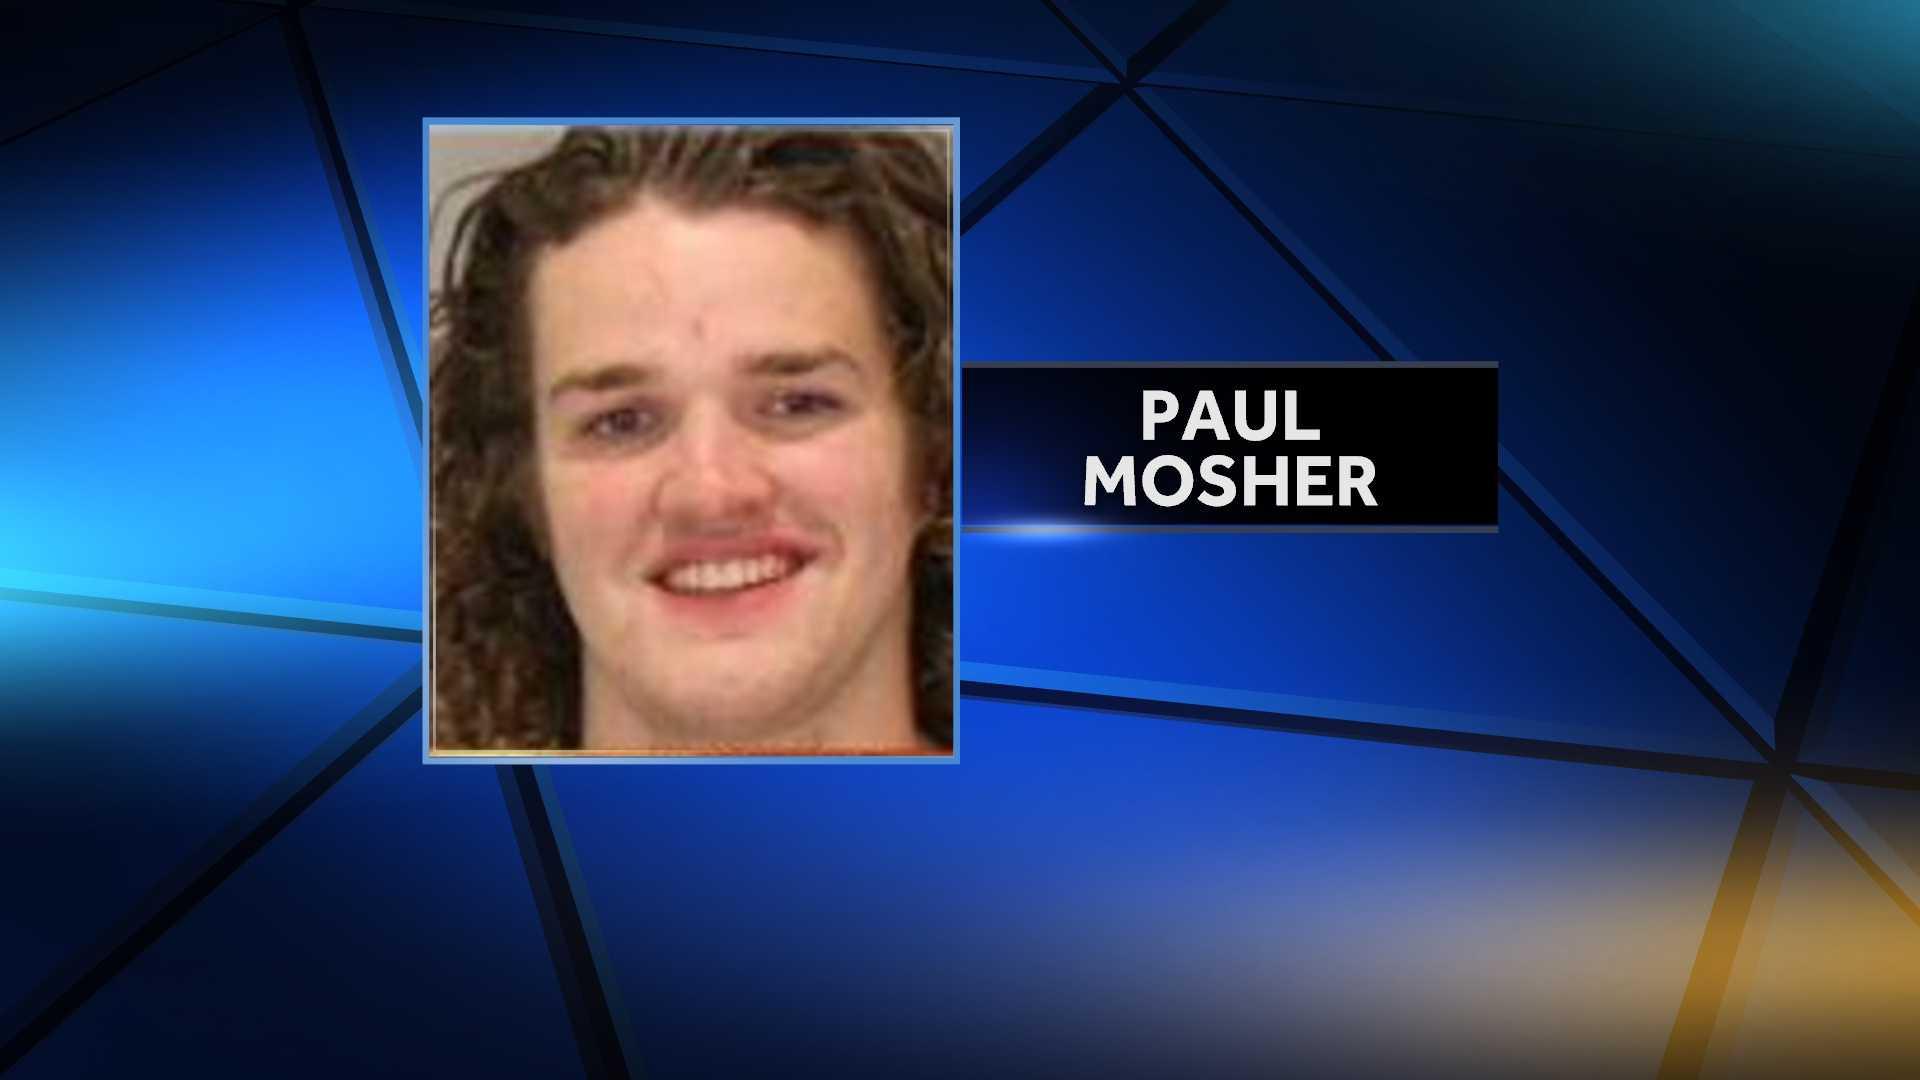 Paul Mosher